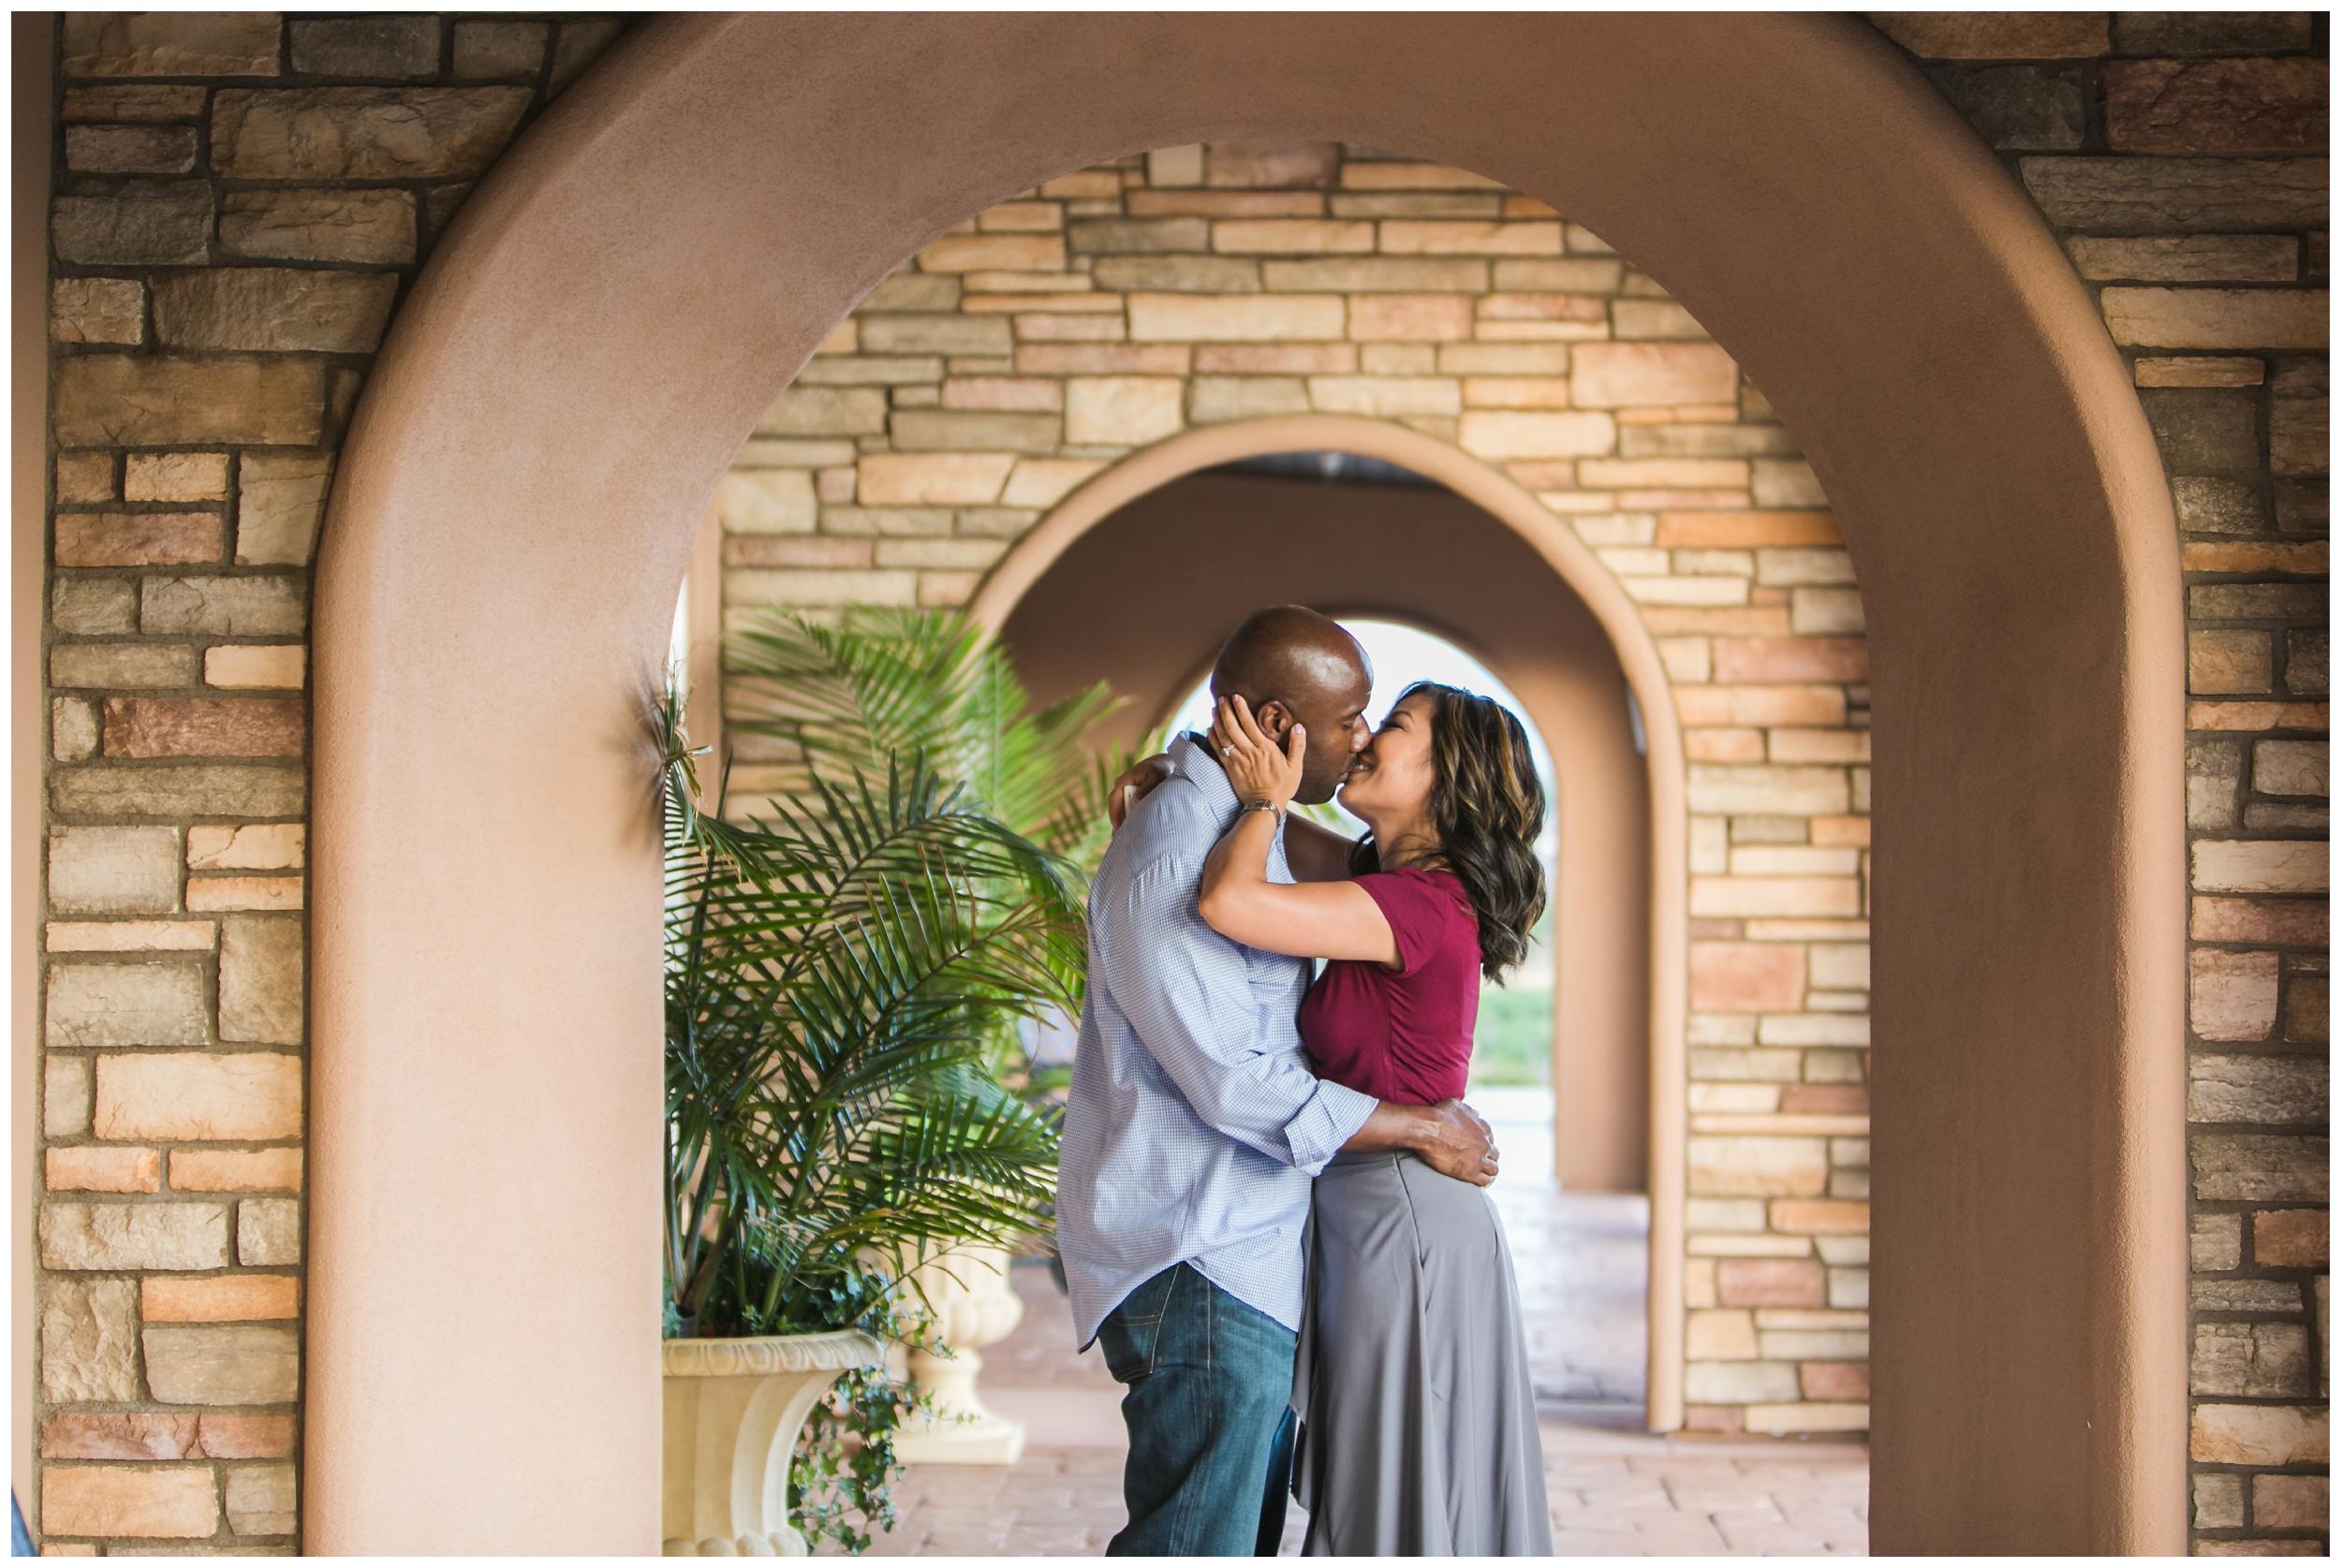 temecula-winery-engagement-wedding-photographer-carrie-vines0002.jpg